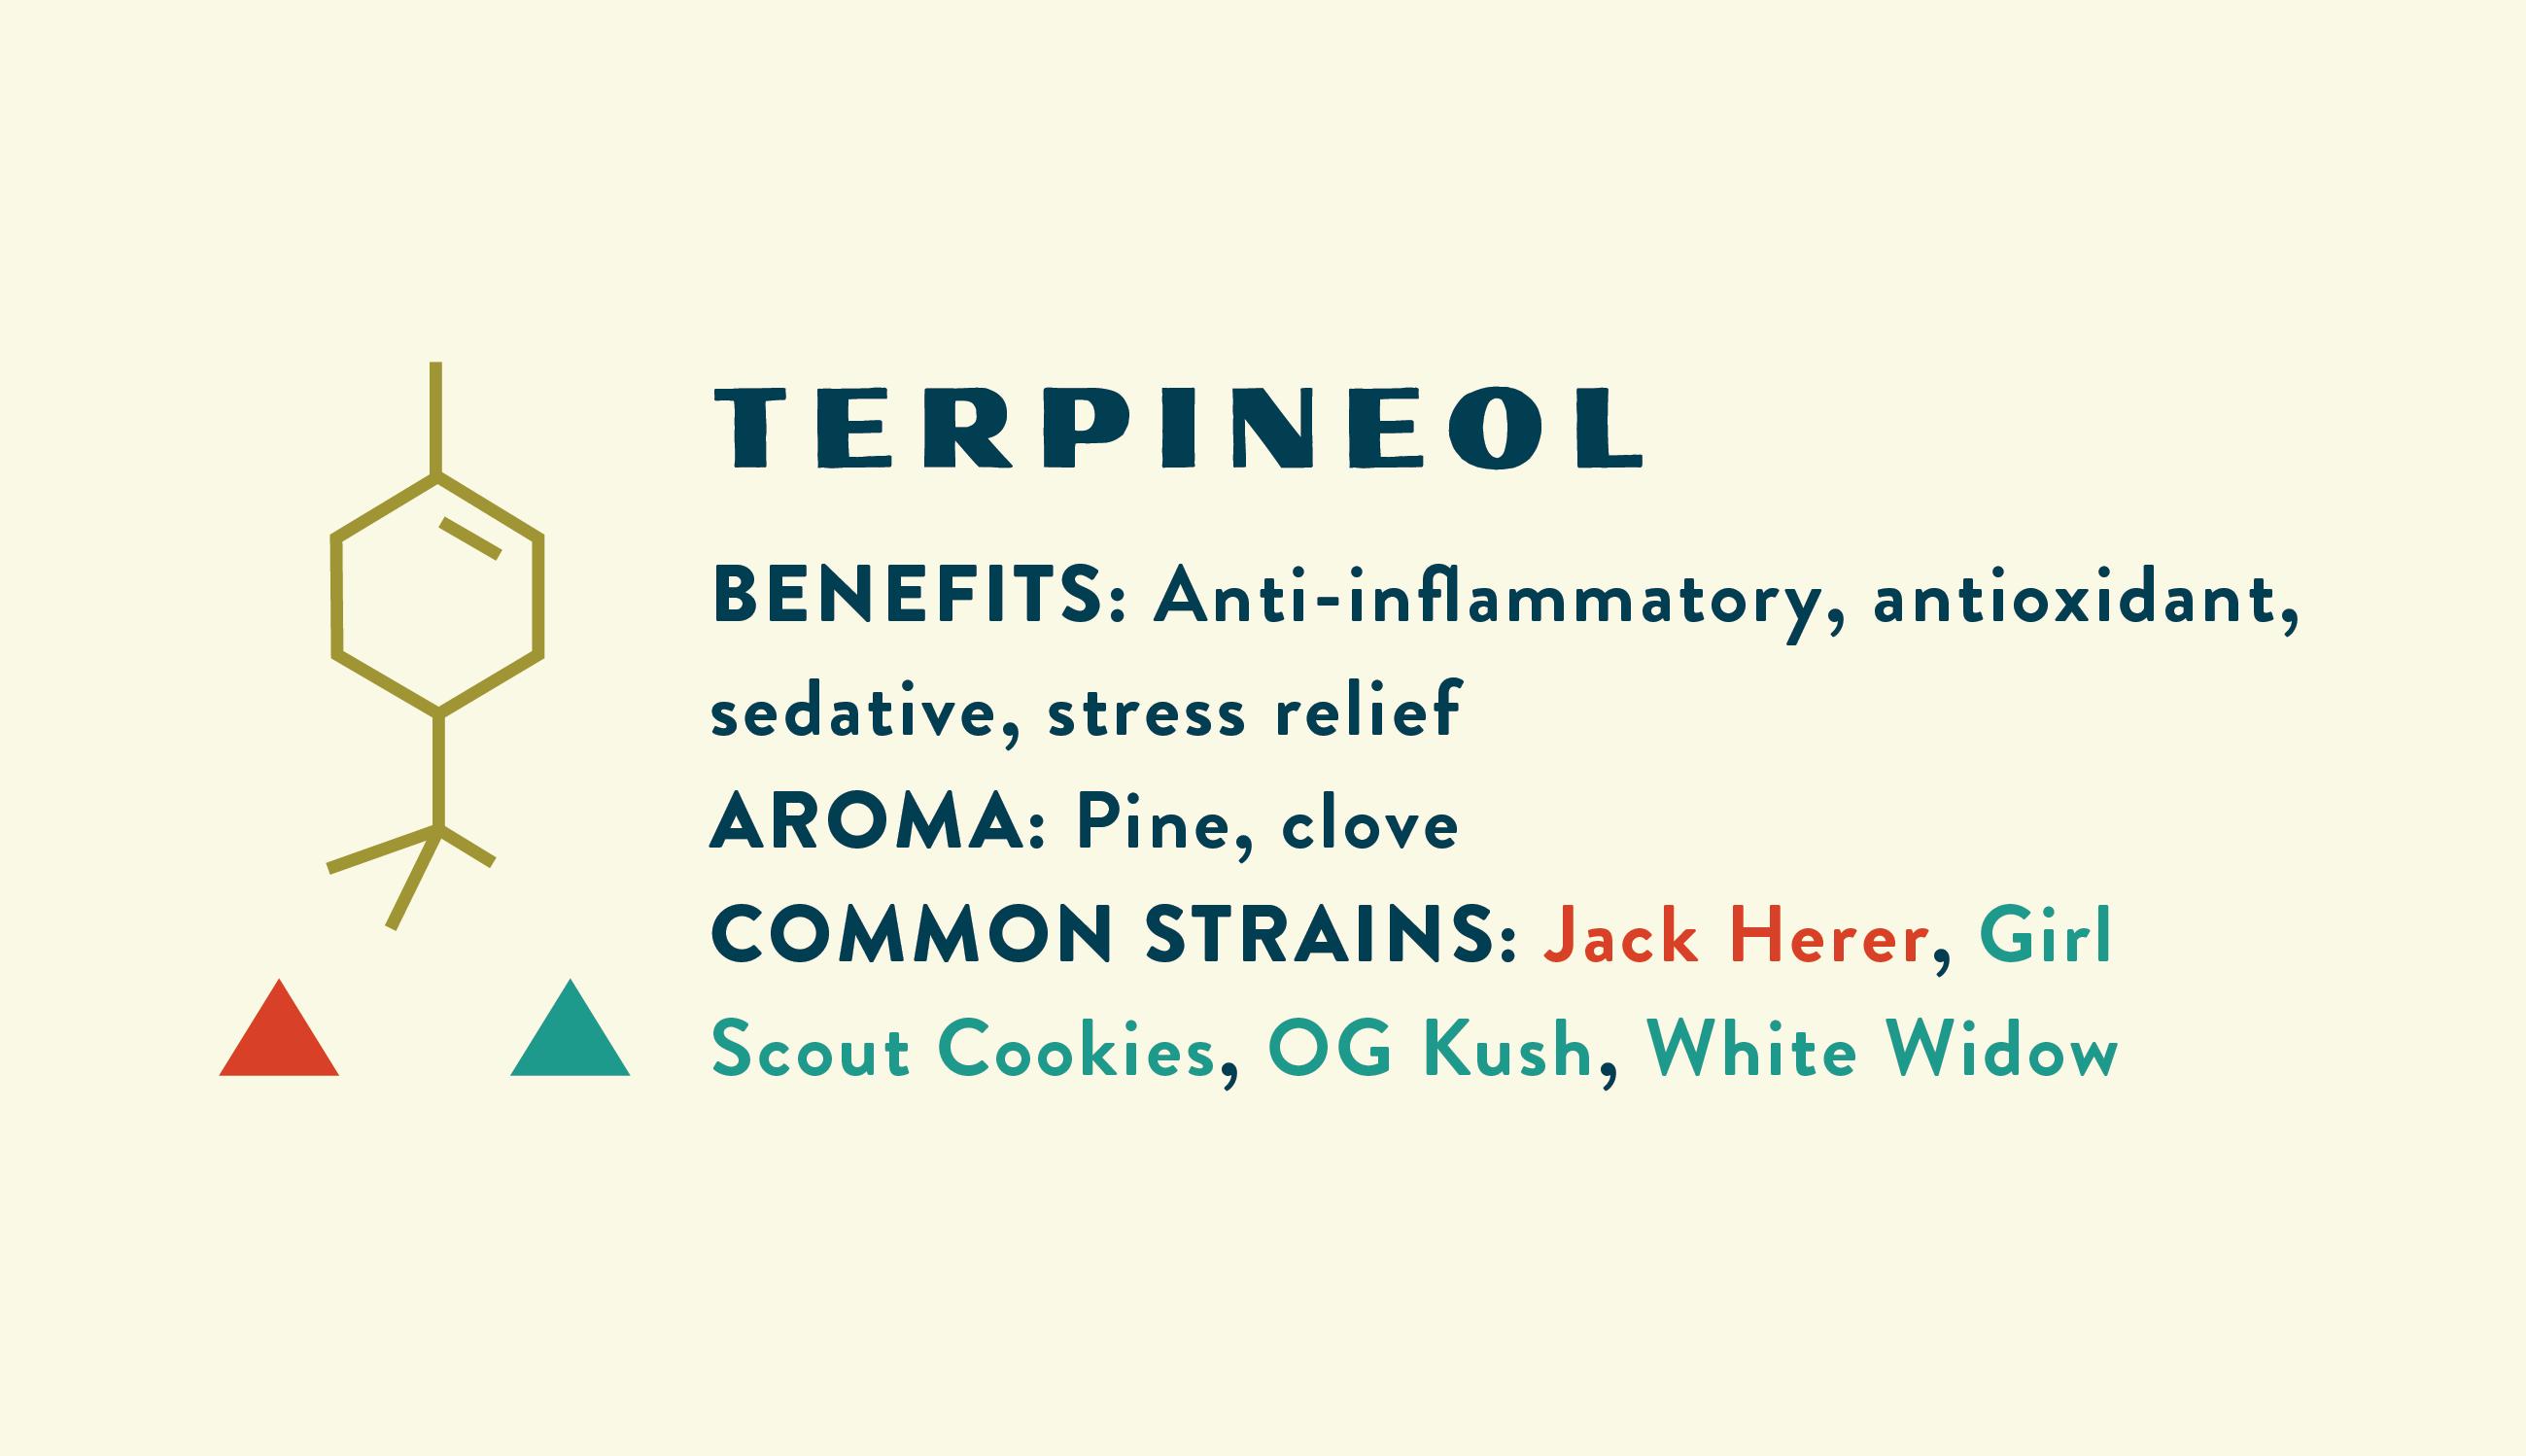 Terpineol Information